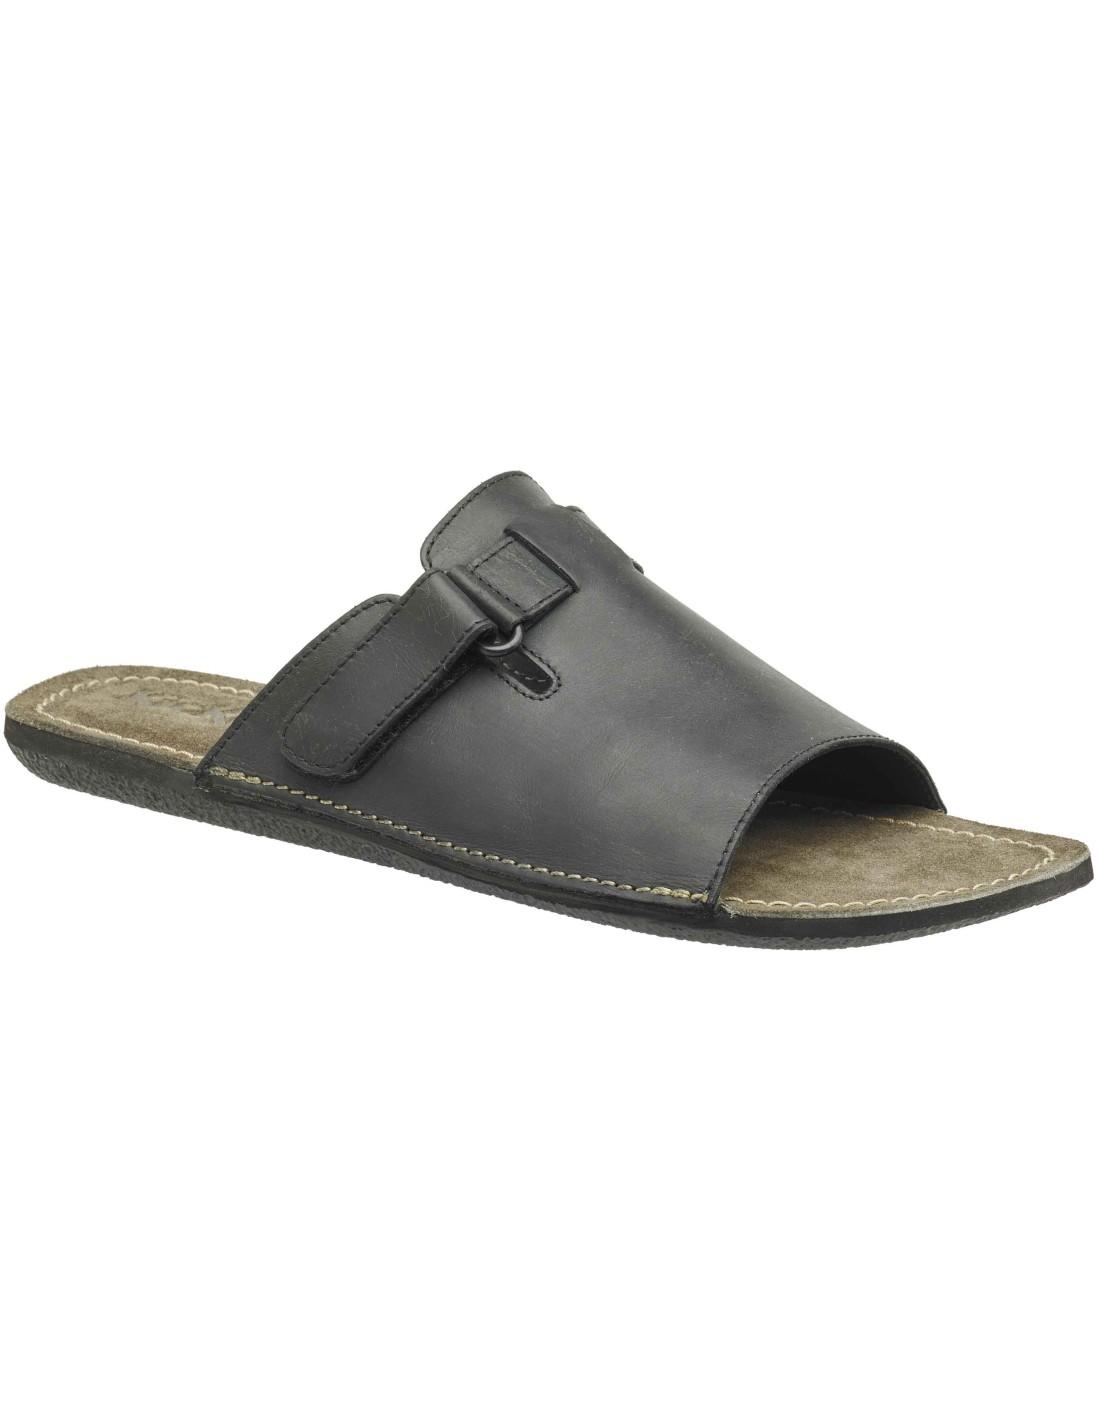 1ac50329 zapato hombre, sandalias hombre, sandalia hombre Kickers,comprar ...